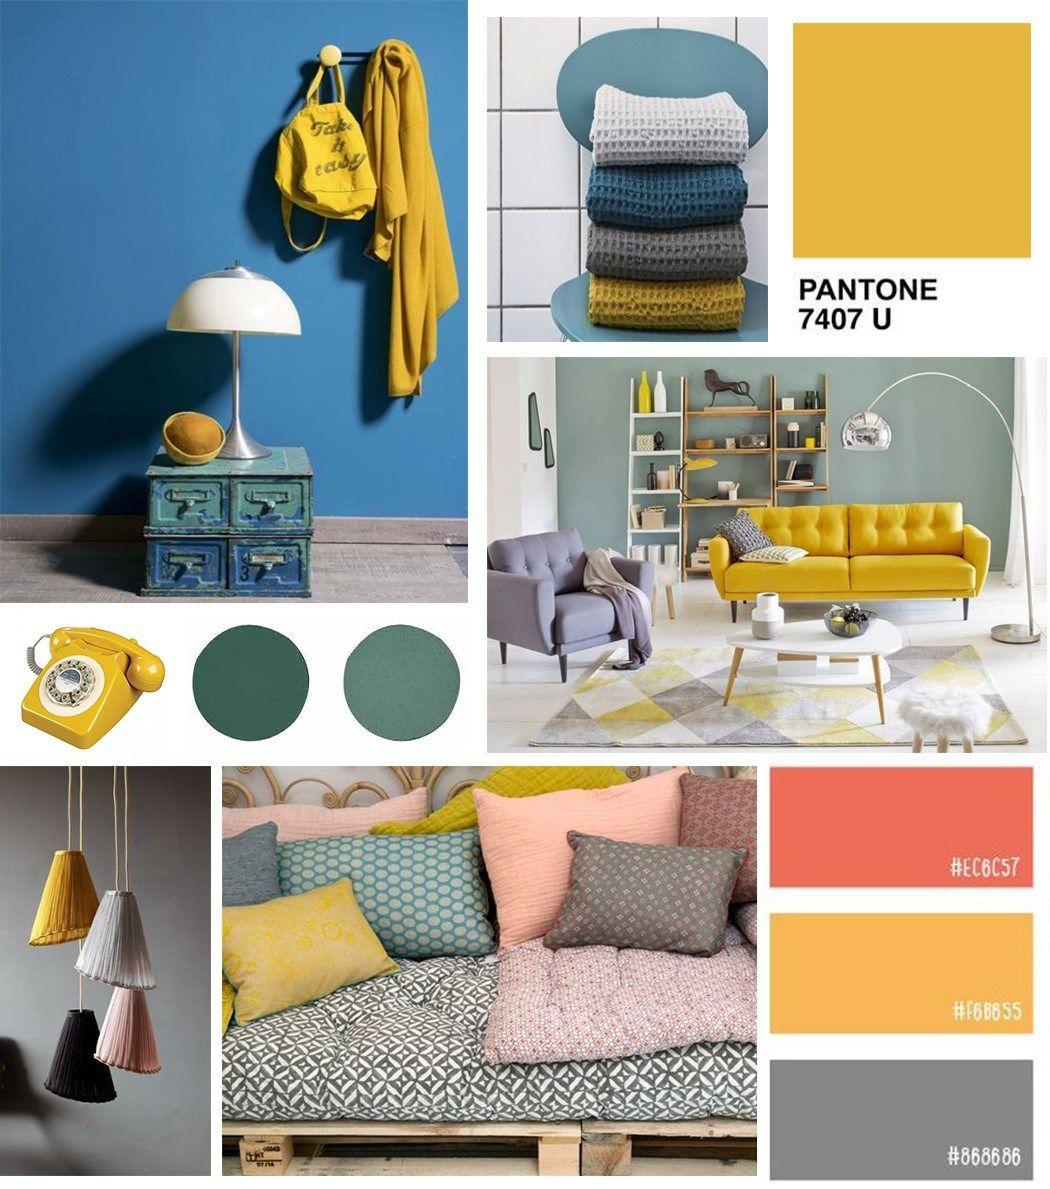 jaune moutarde association avec autres couleurs v2. Black Bedroom Furniture Sets. Home Design Ideas